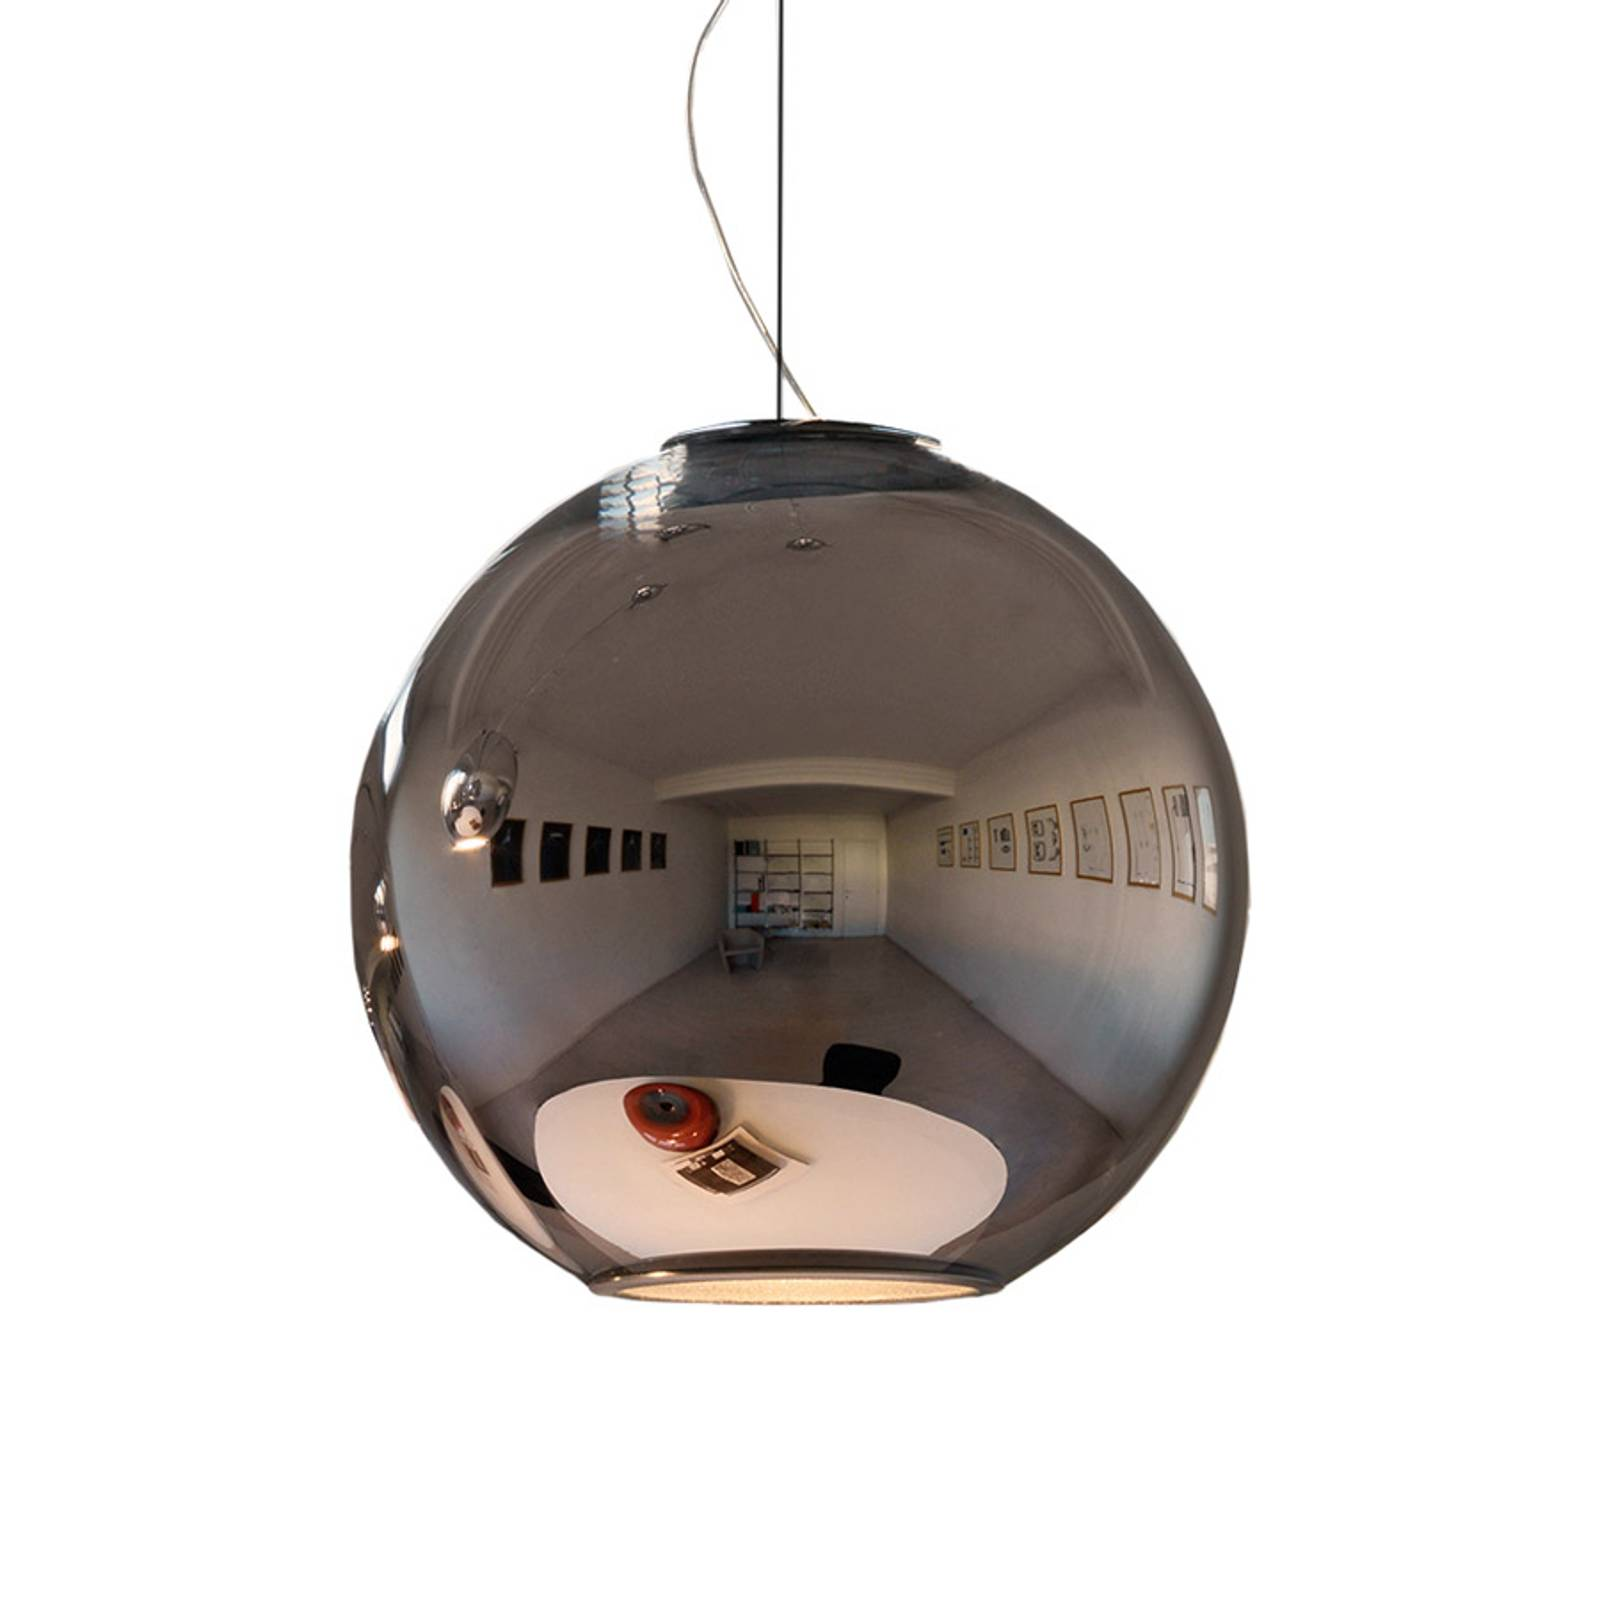 Spiegelende hanglamp GLOBO DI LUCE, diameter 30 cm